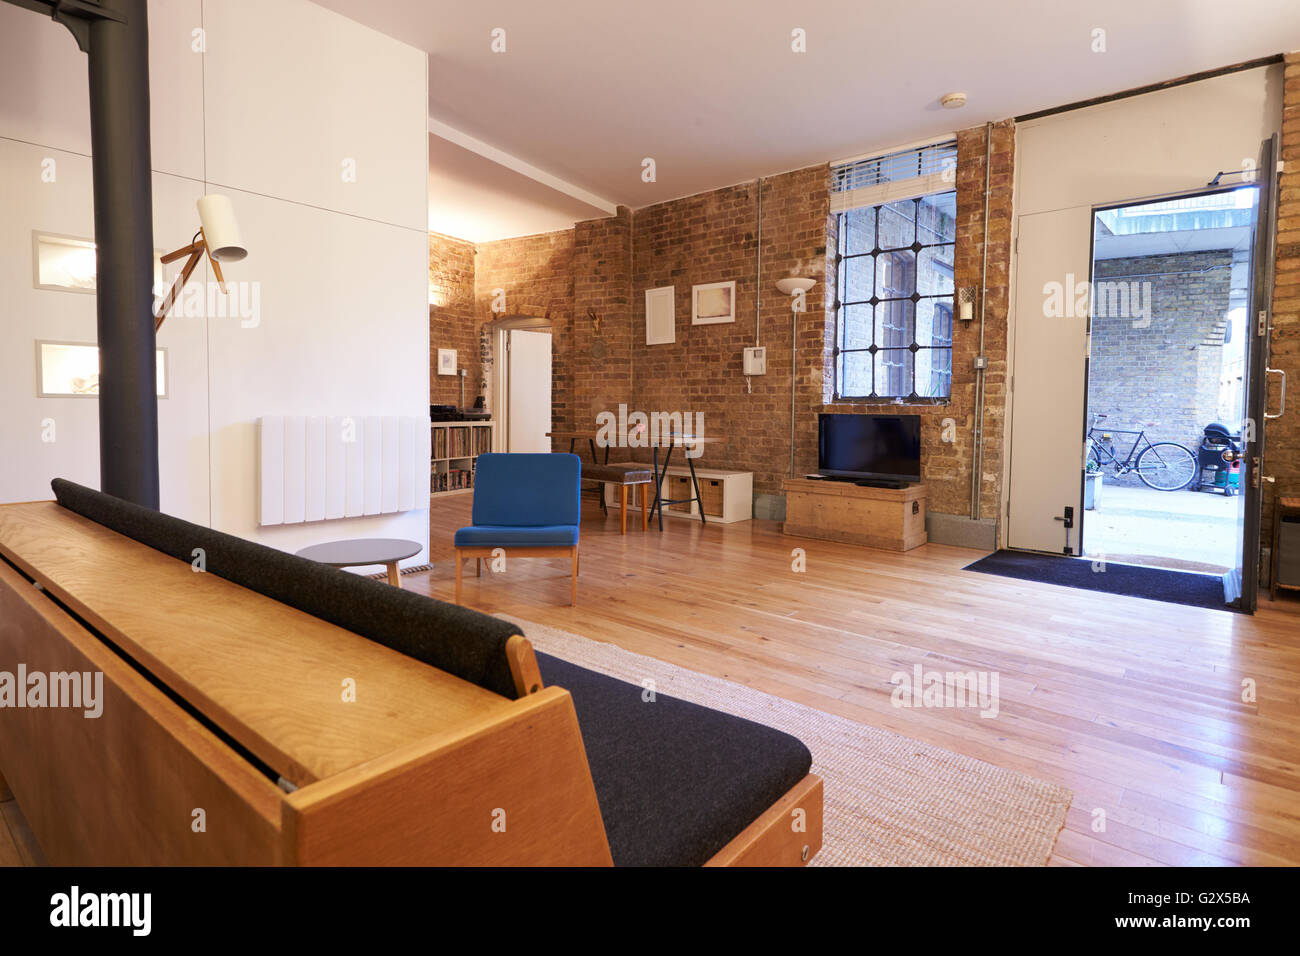 Empty Interior Of Modern Stylish Apartment - Stock Image